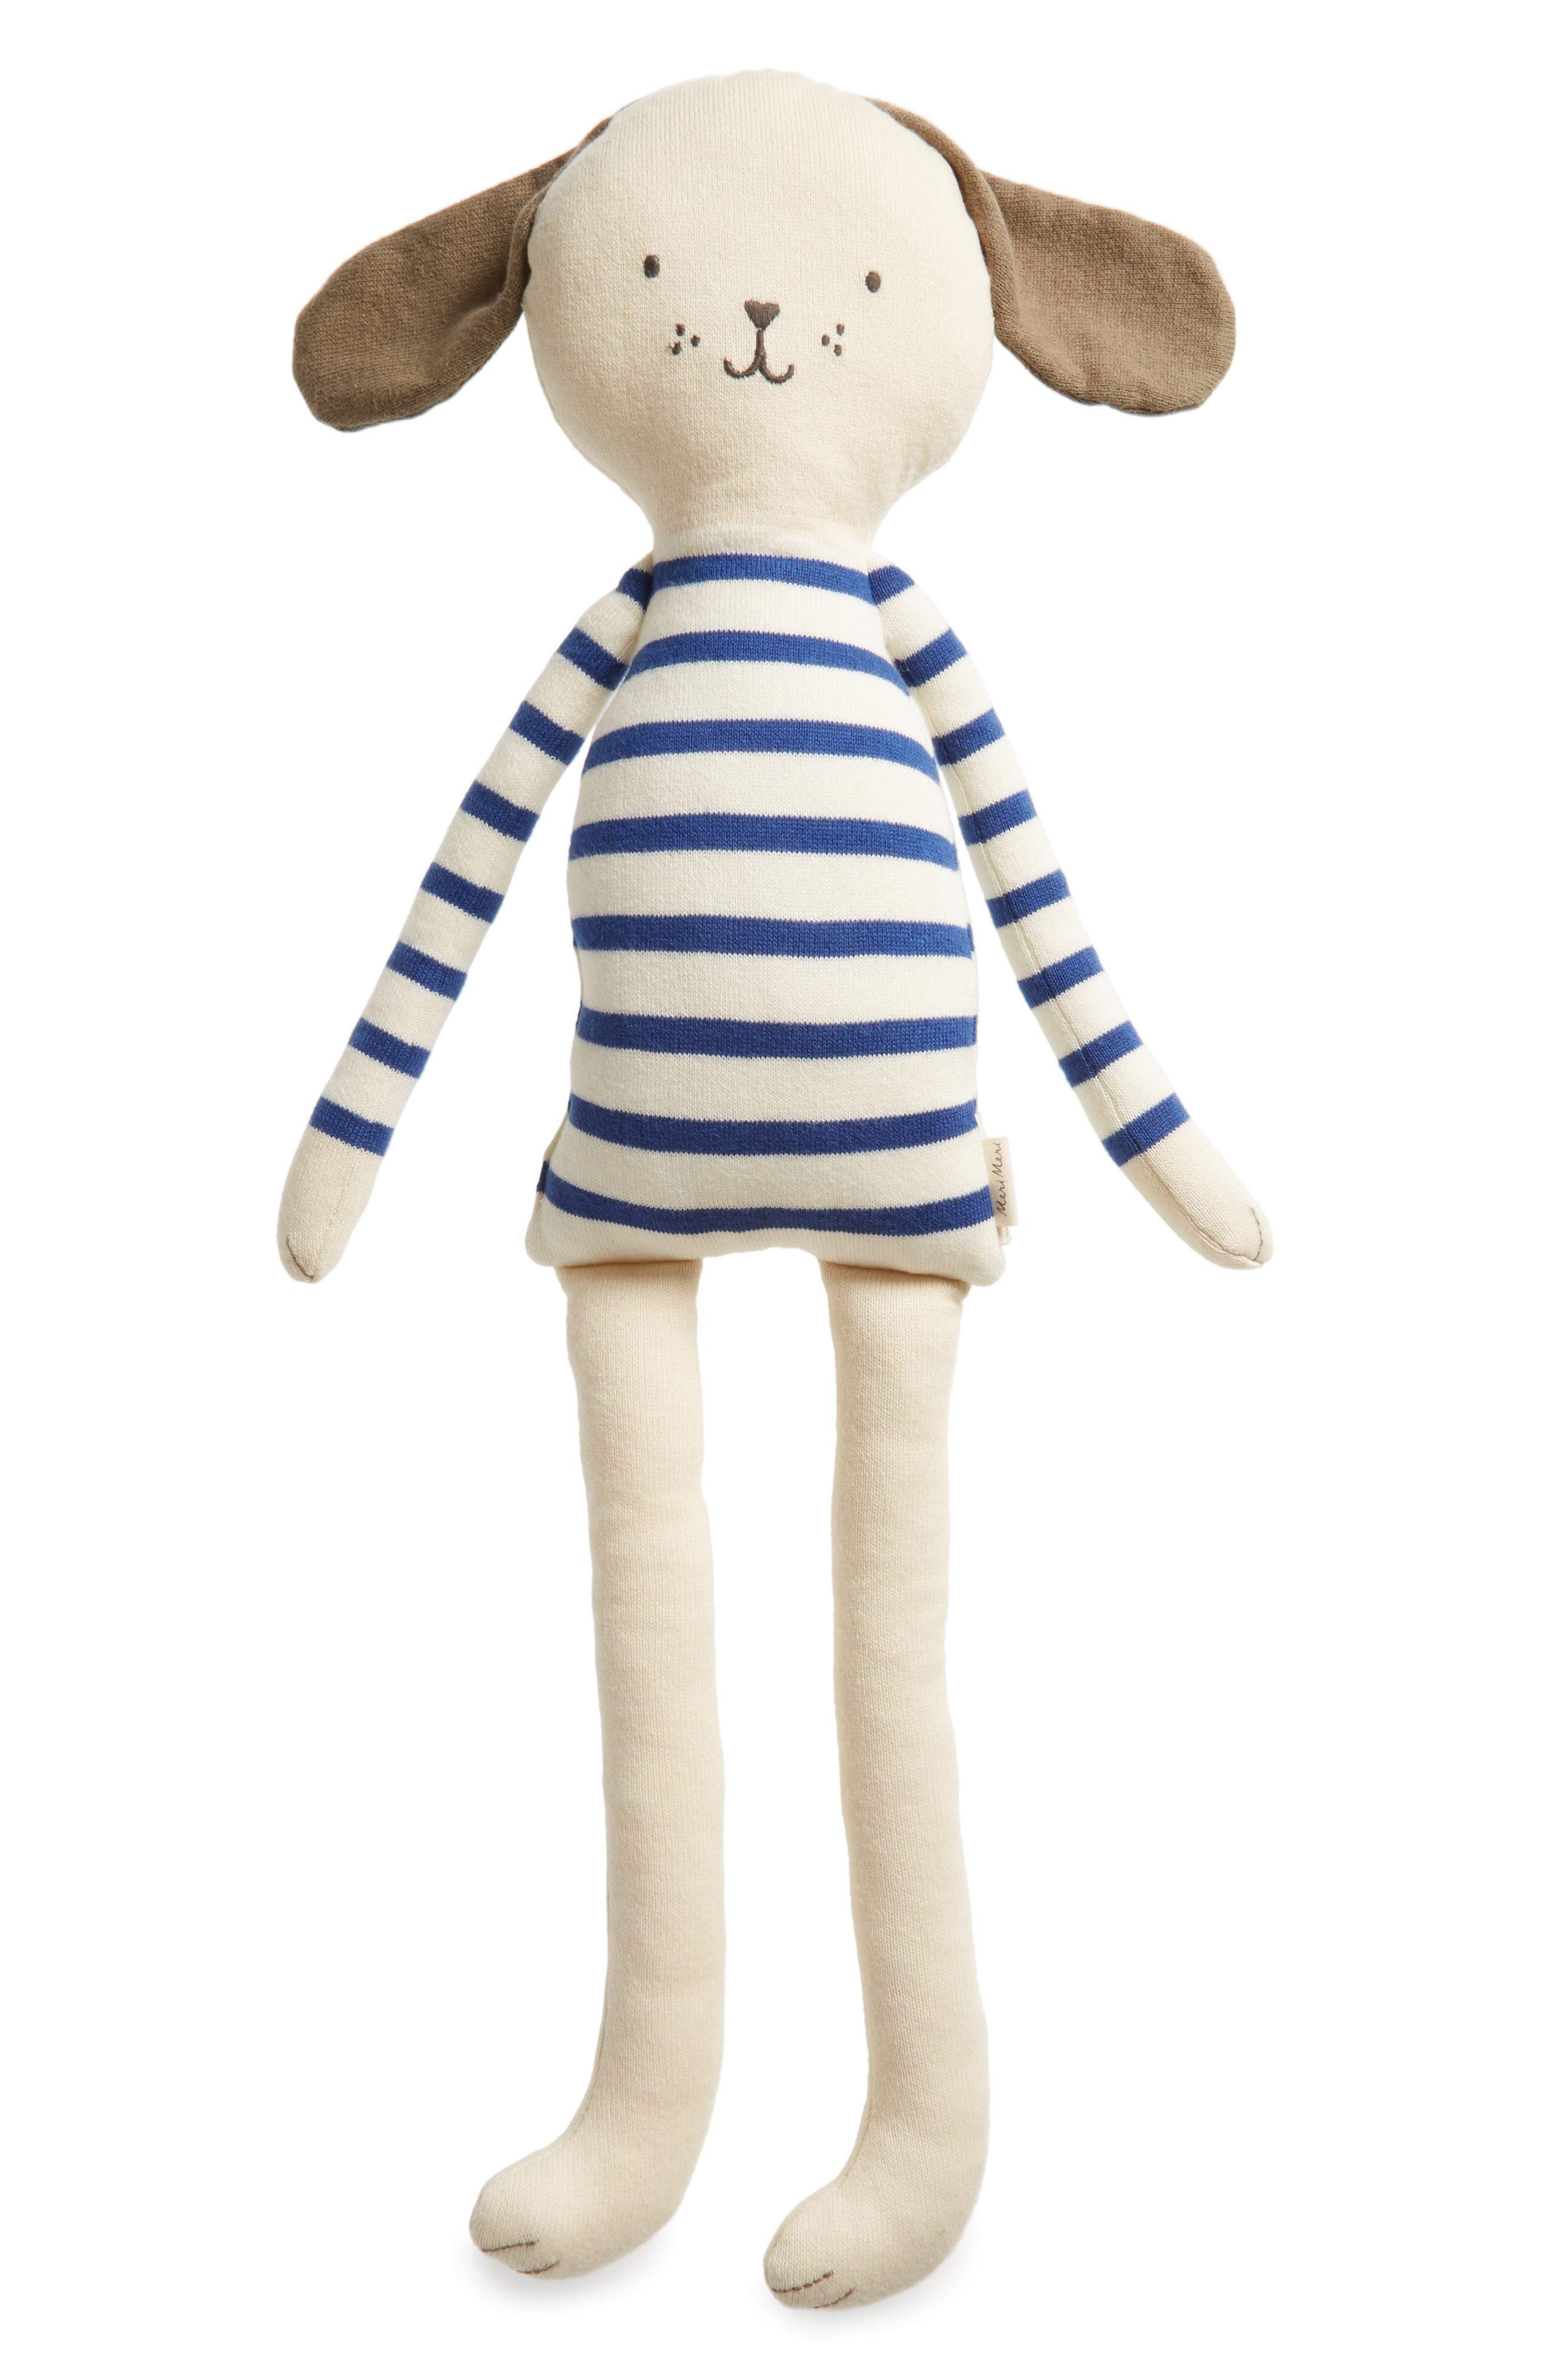 Main Image - Meri Meri Knit Organic Cotton Dog Cushion/Toy